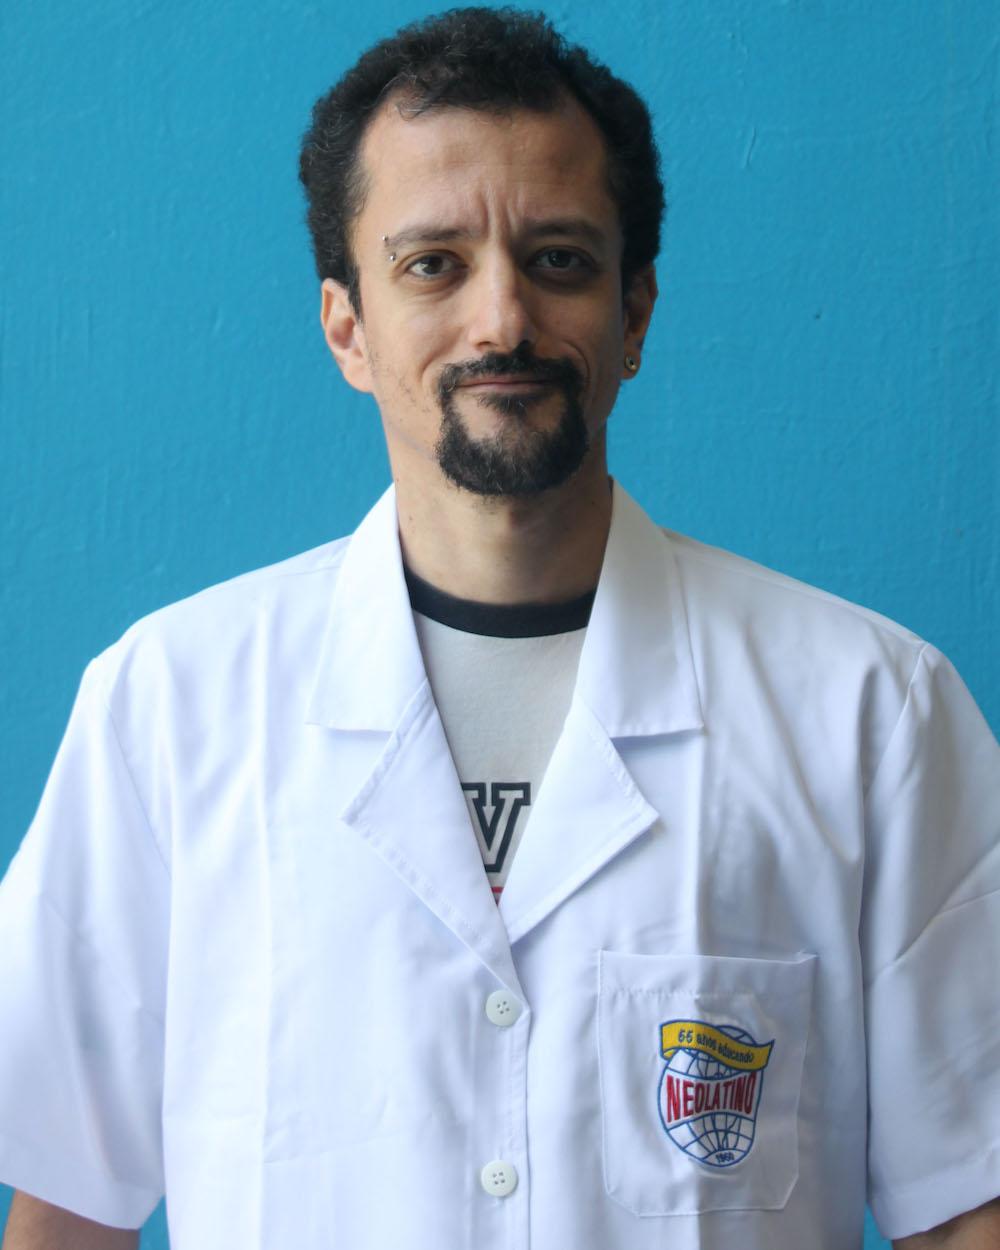 Prof. ANDRÉ